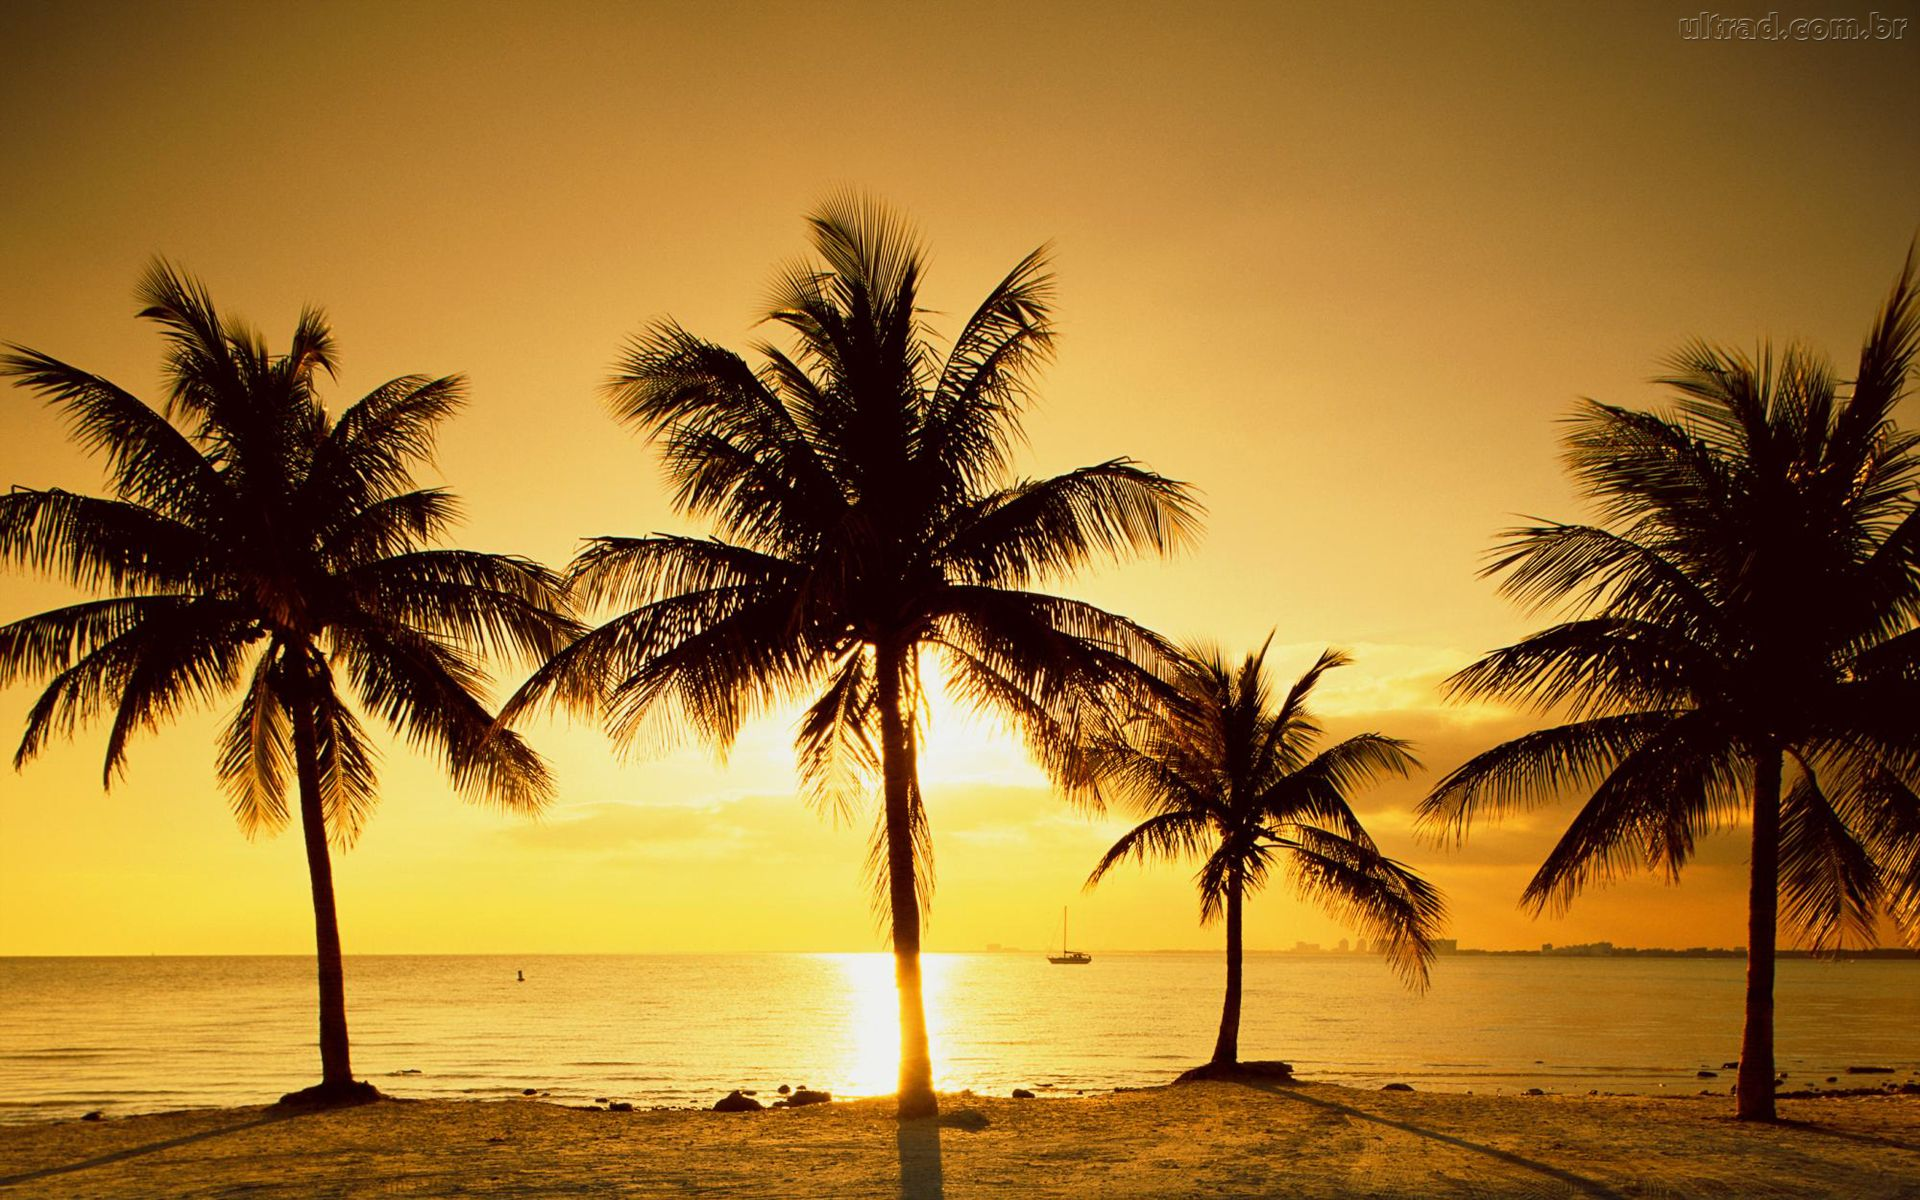 refletindo na praia papel - photo #15